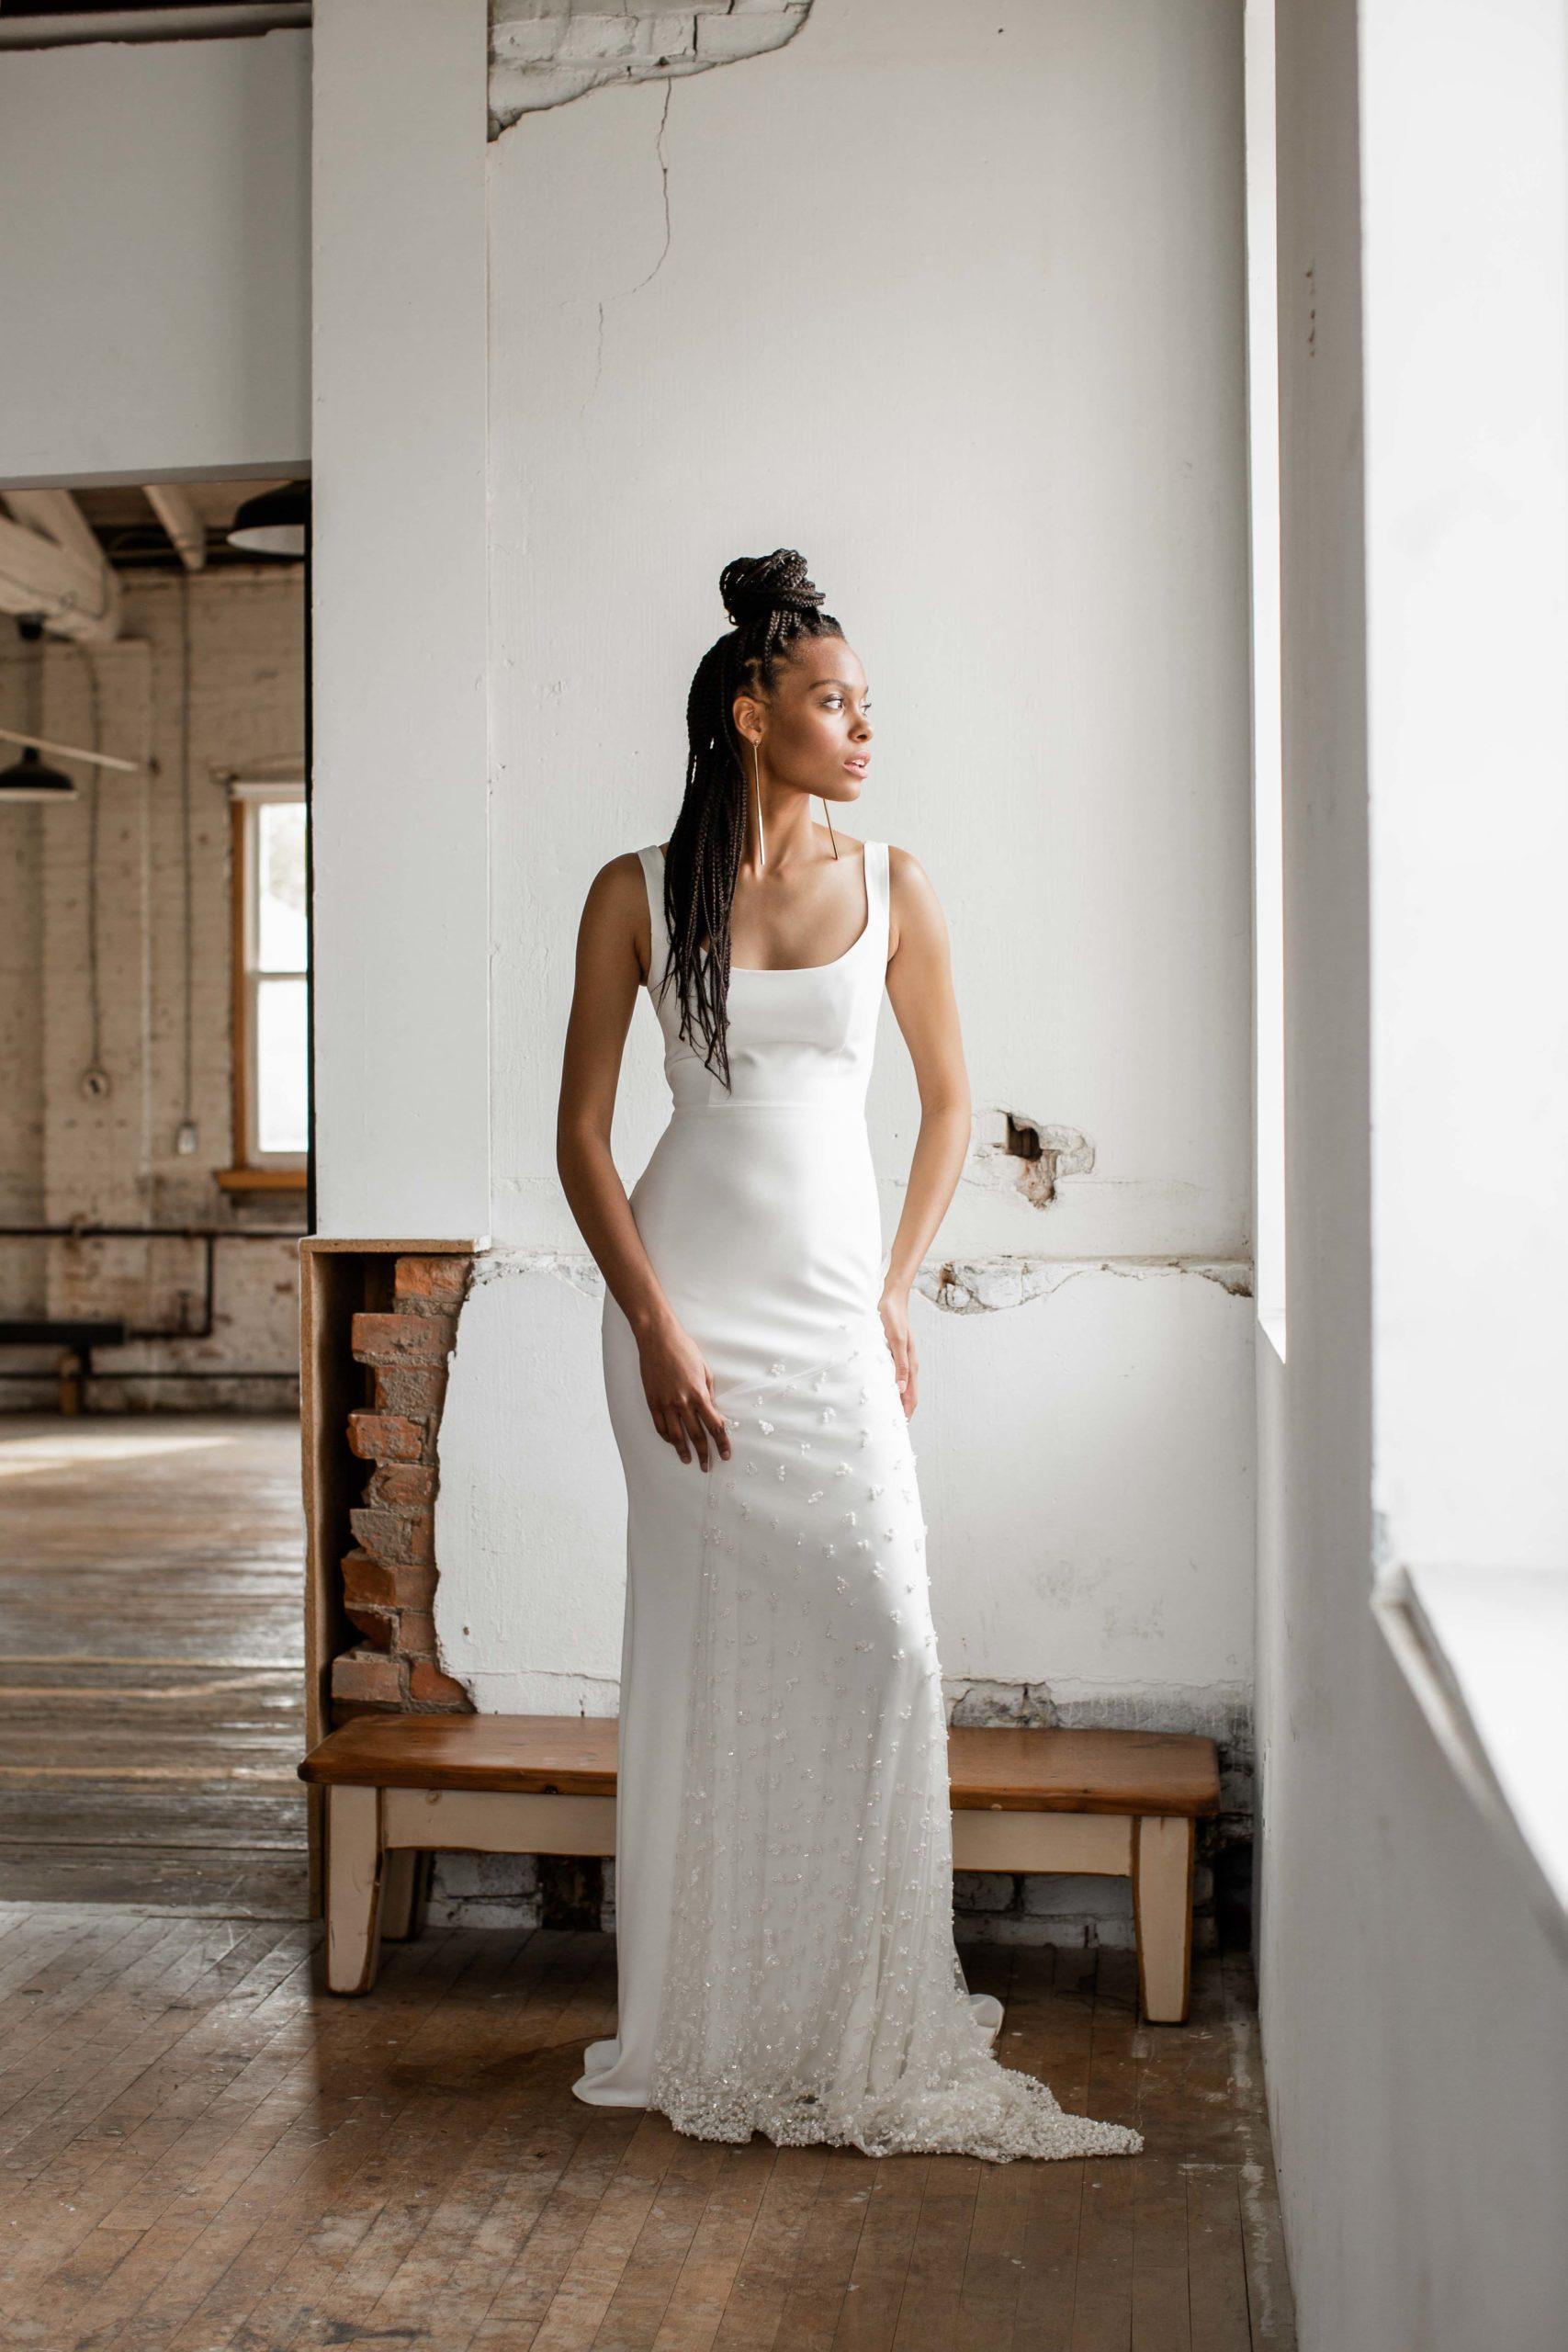 Palmer Anais Anette by White Concepts Aachen